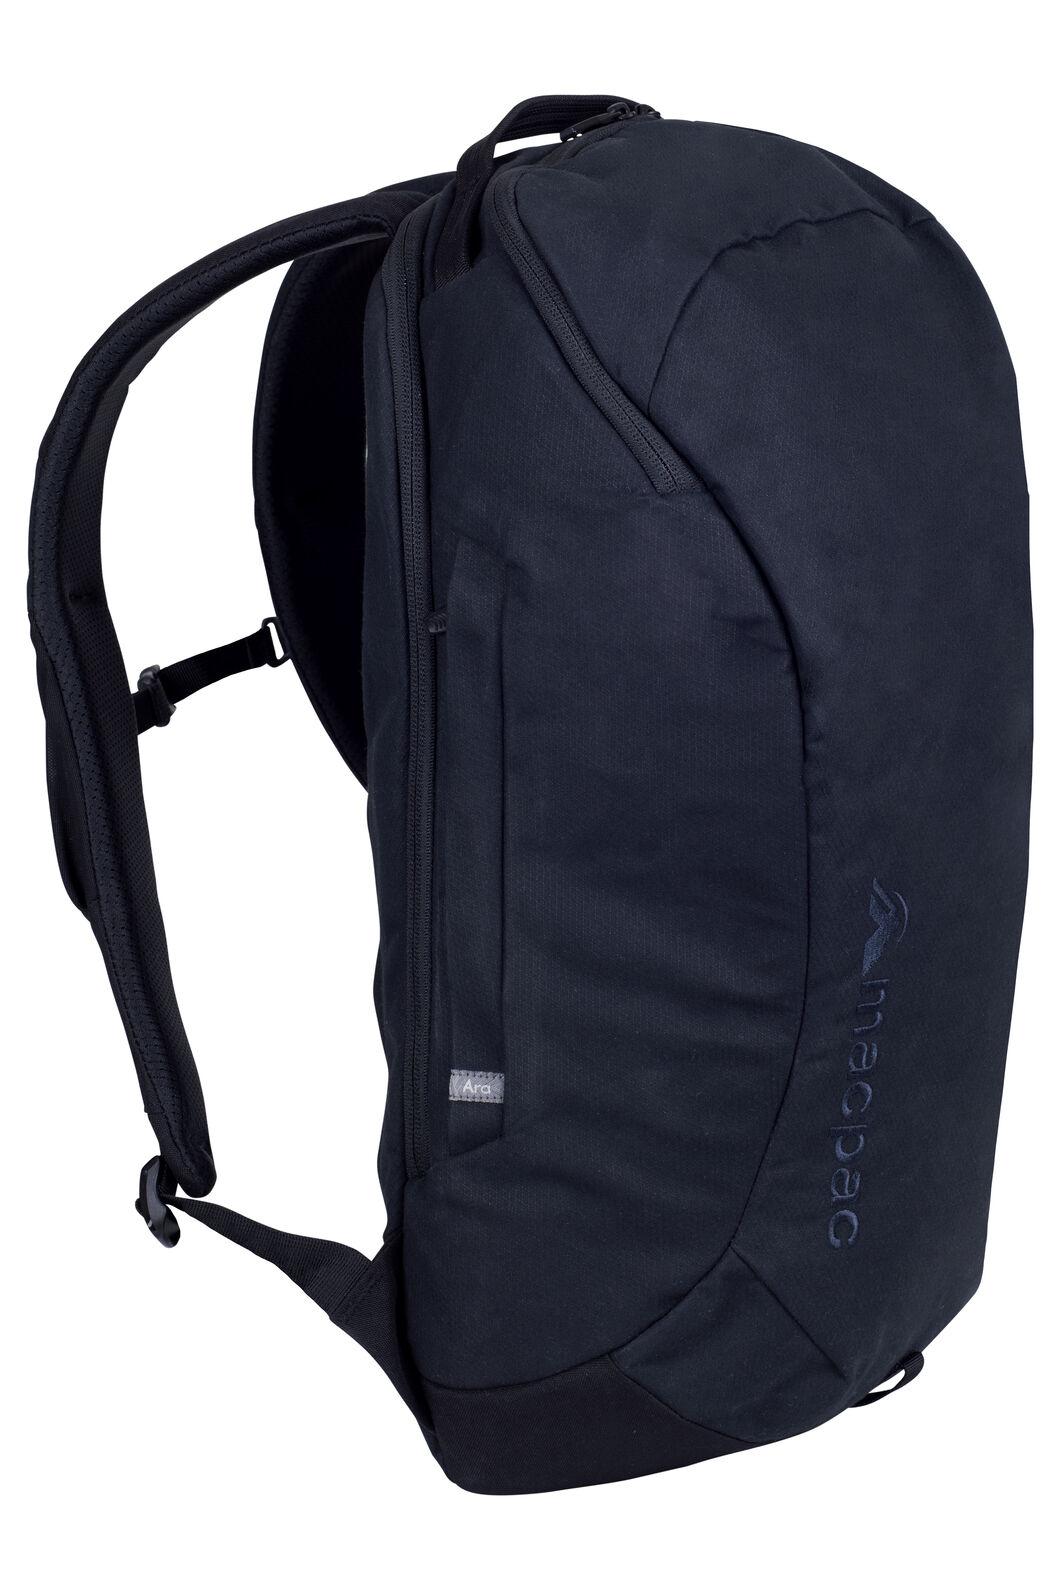 Macpac Ara 19L AzTec® Backpack, Black, hi-res